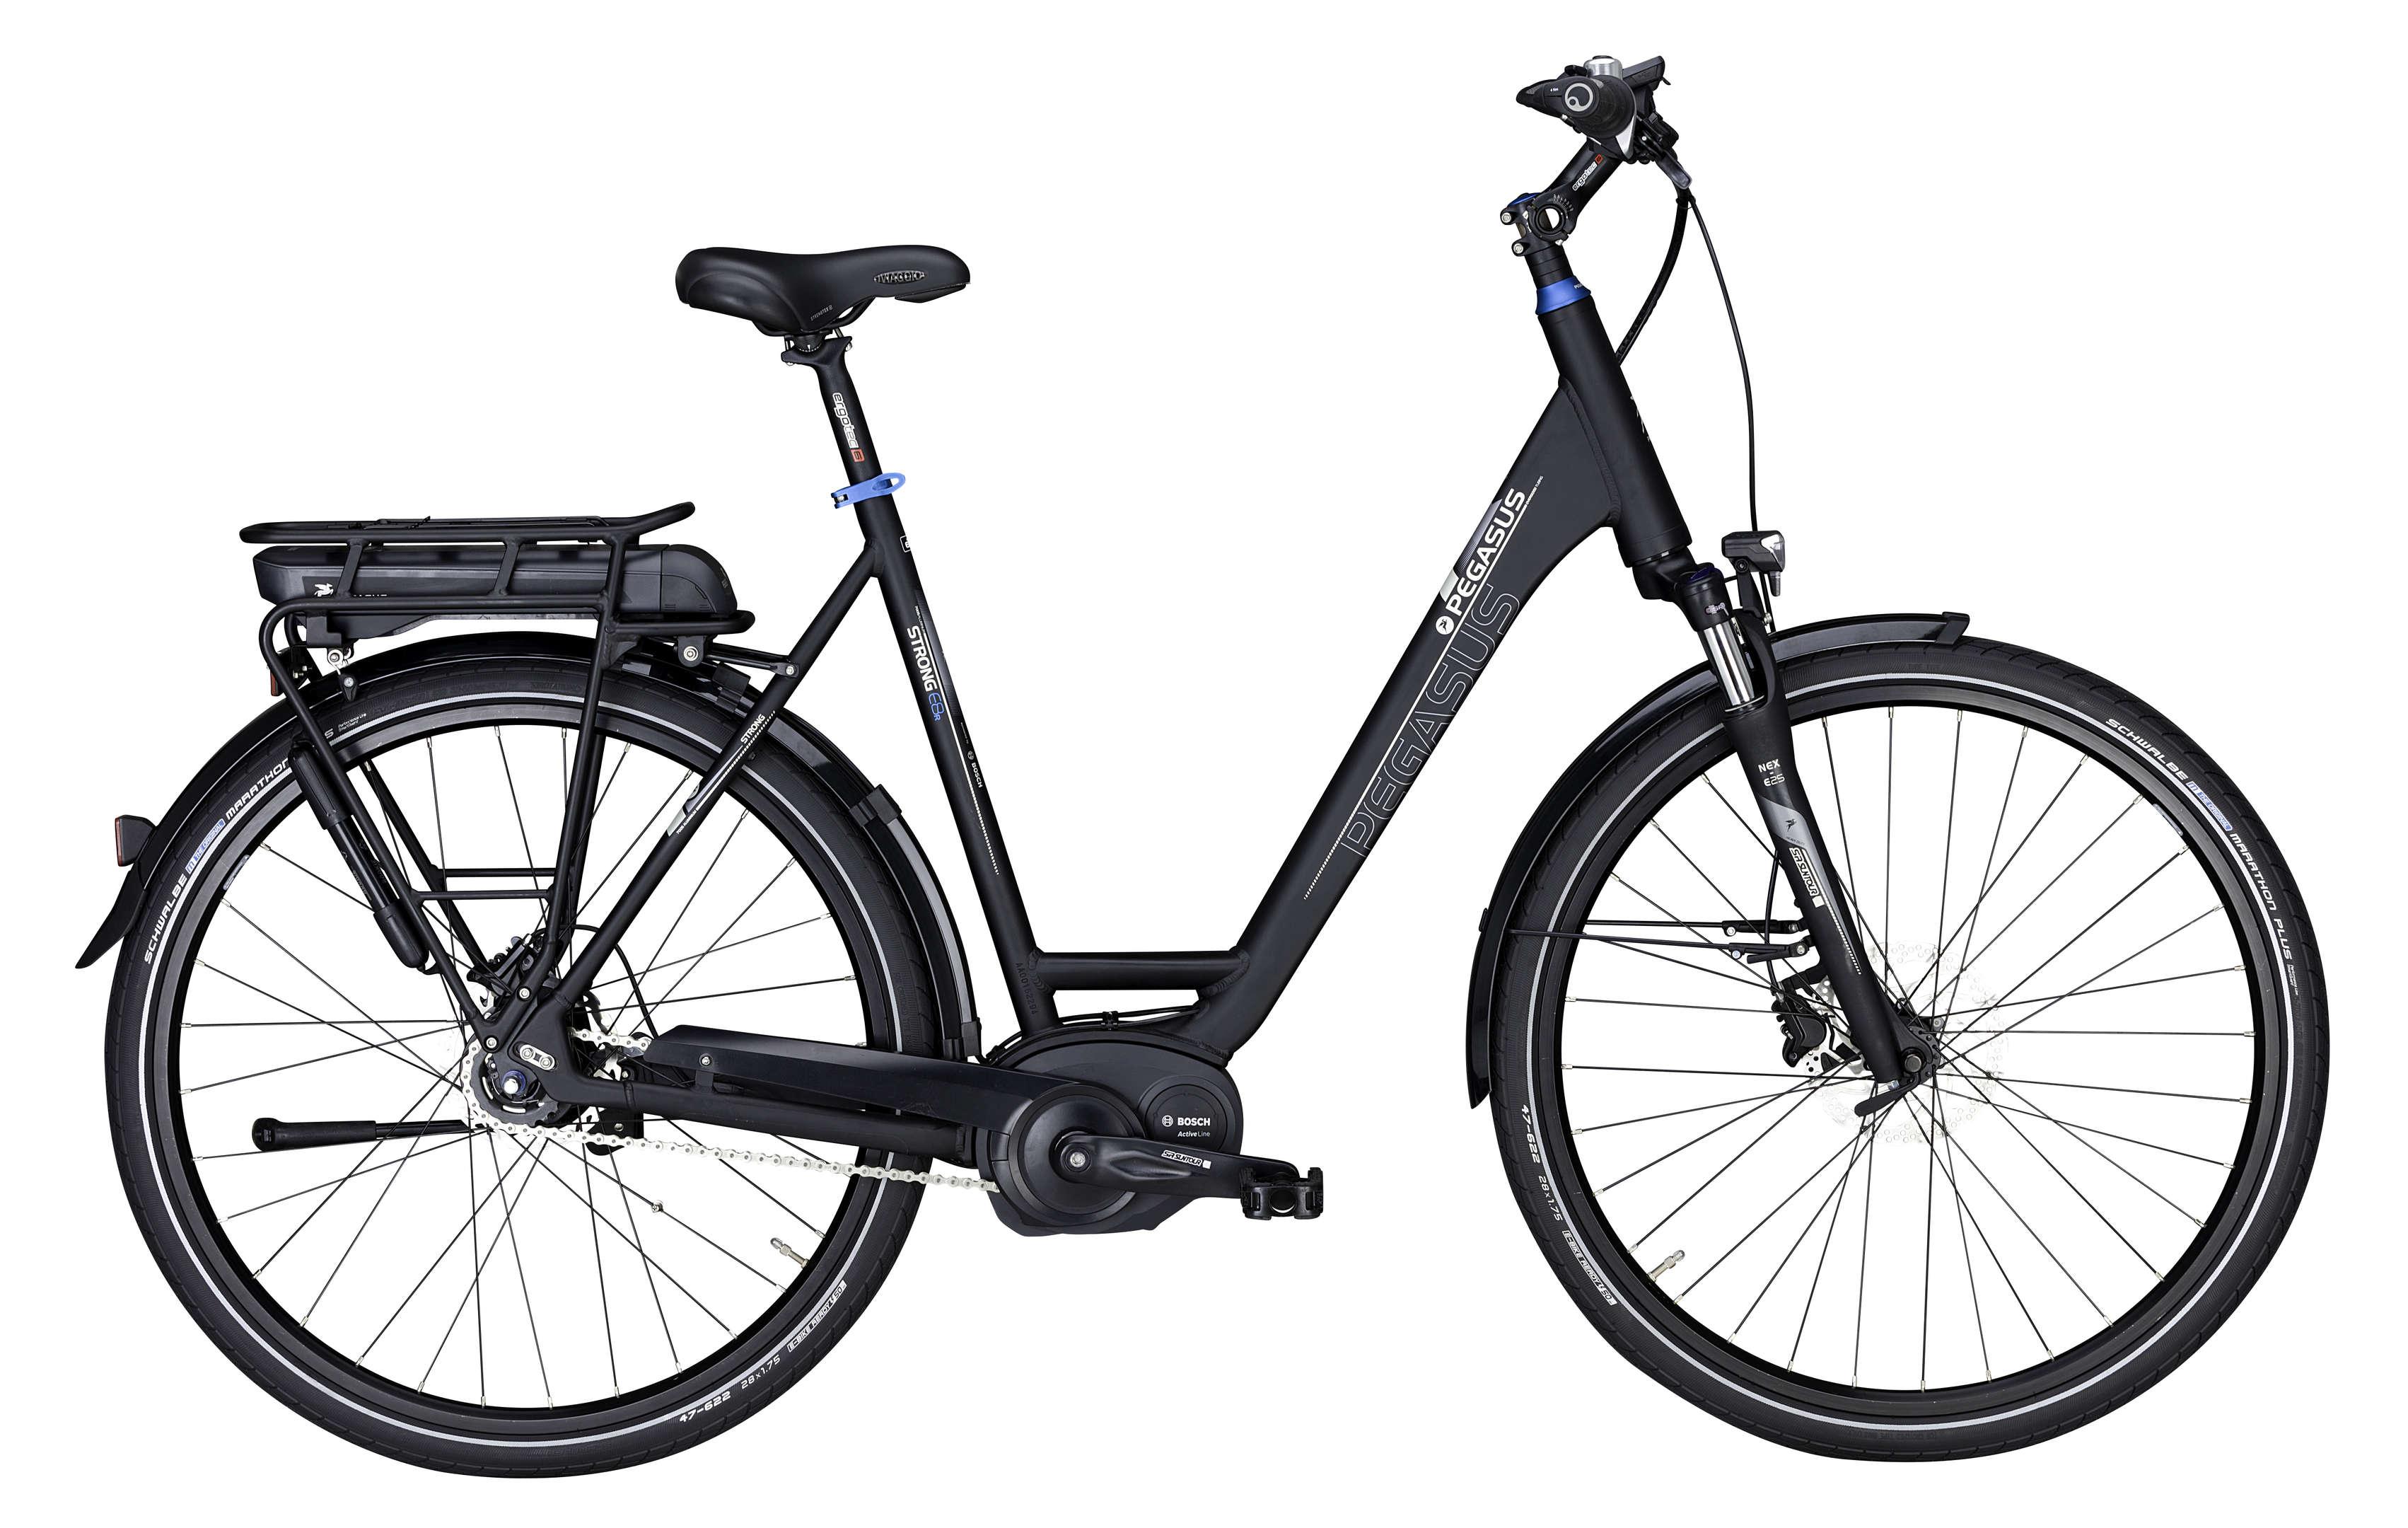 pegasus e bike strong e8r eurorad bikeleasingeurorad. Black Bedroom Furniture Sets. Home Design Ideas